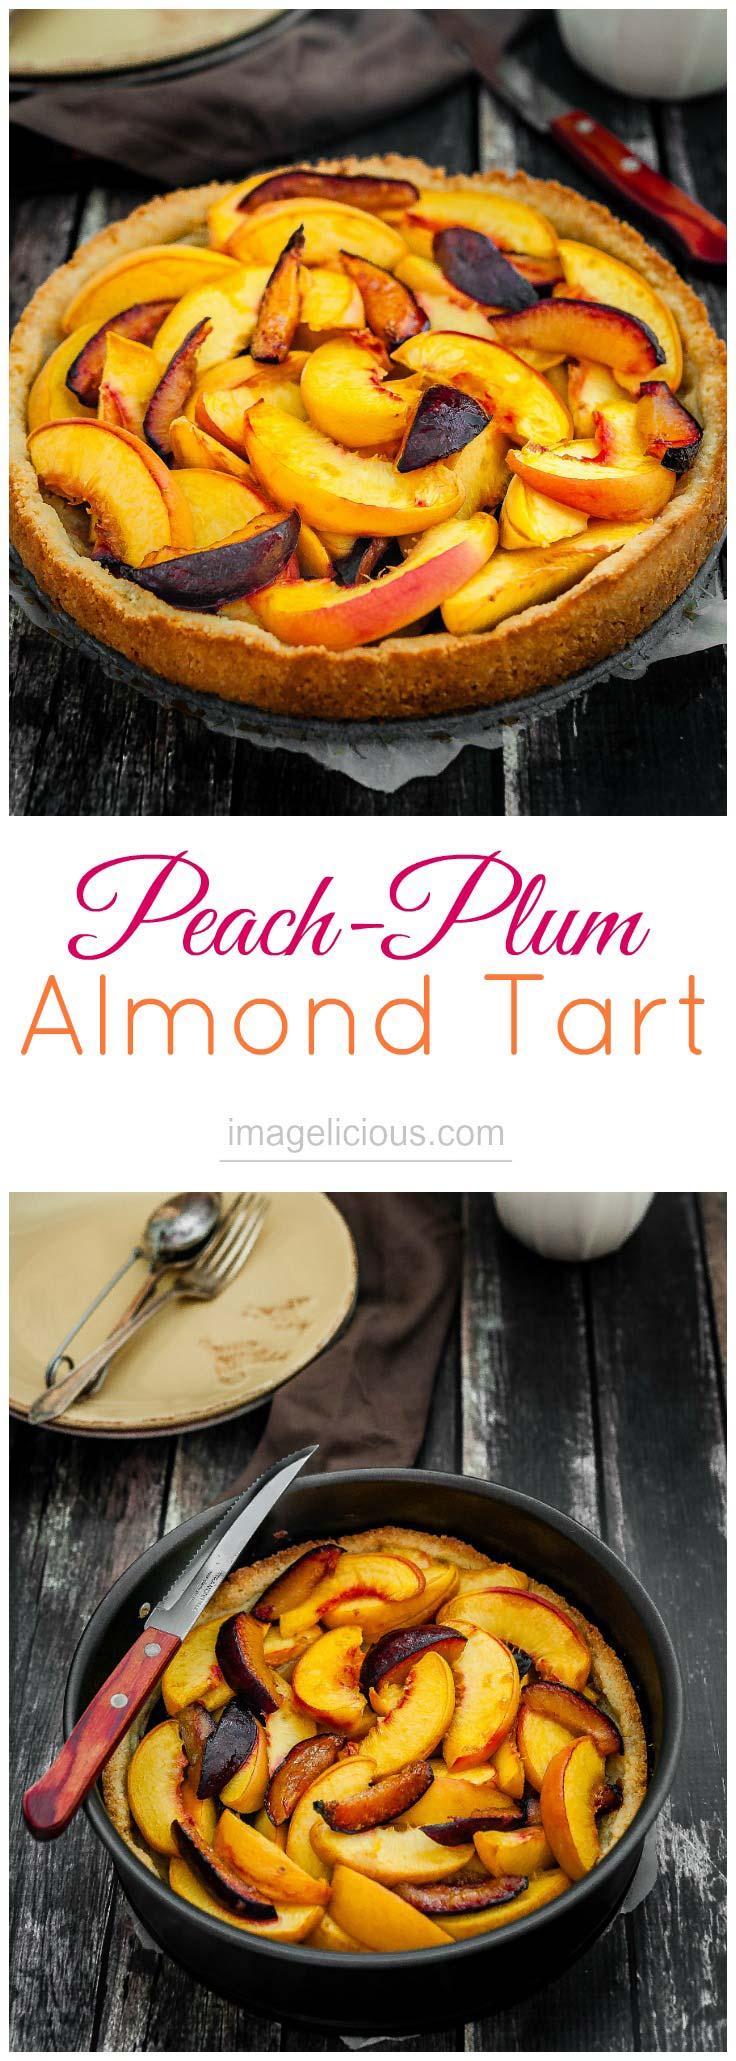 Peach desserts | Plum desserts | Fruit desserts | Fruit recipes | Plum tart | Peach tart | Peach Plum Tart | Tart | Dessert | Baking | Fruit | Stone fruit | Imagelicious